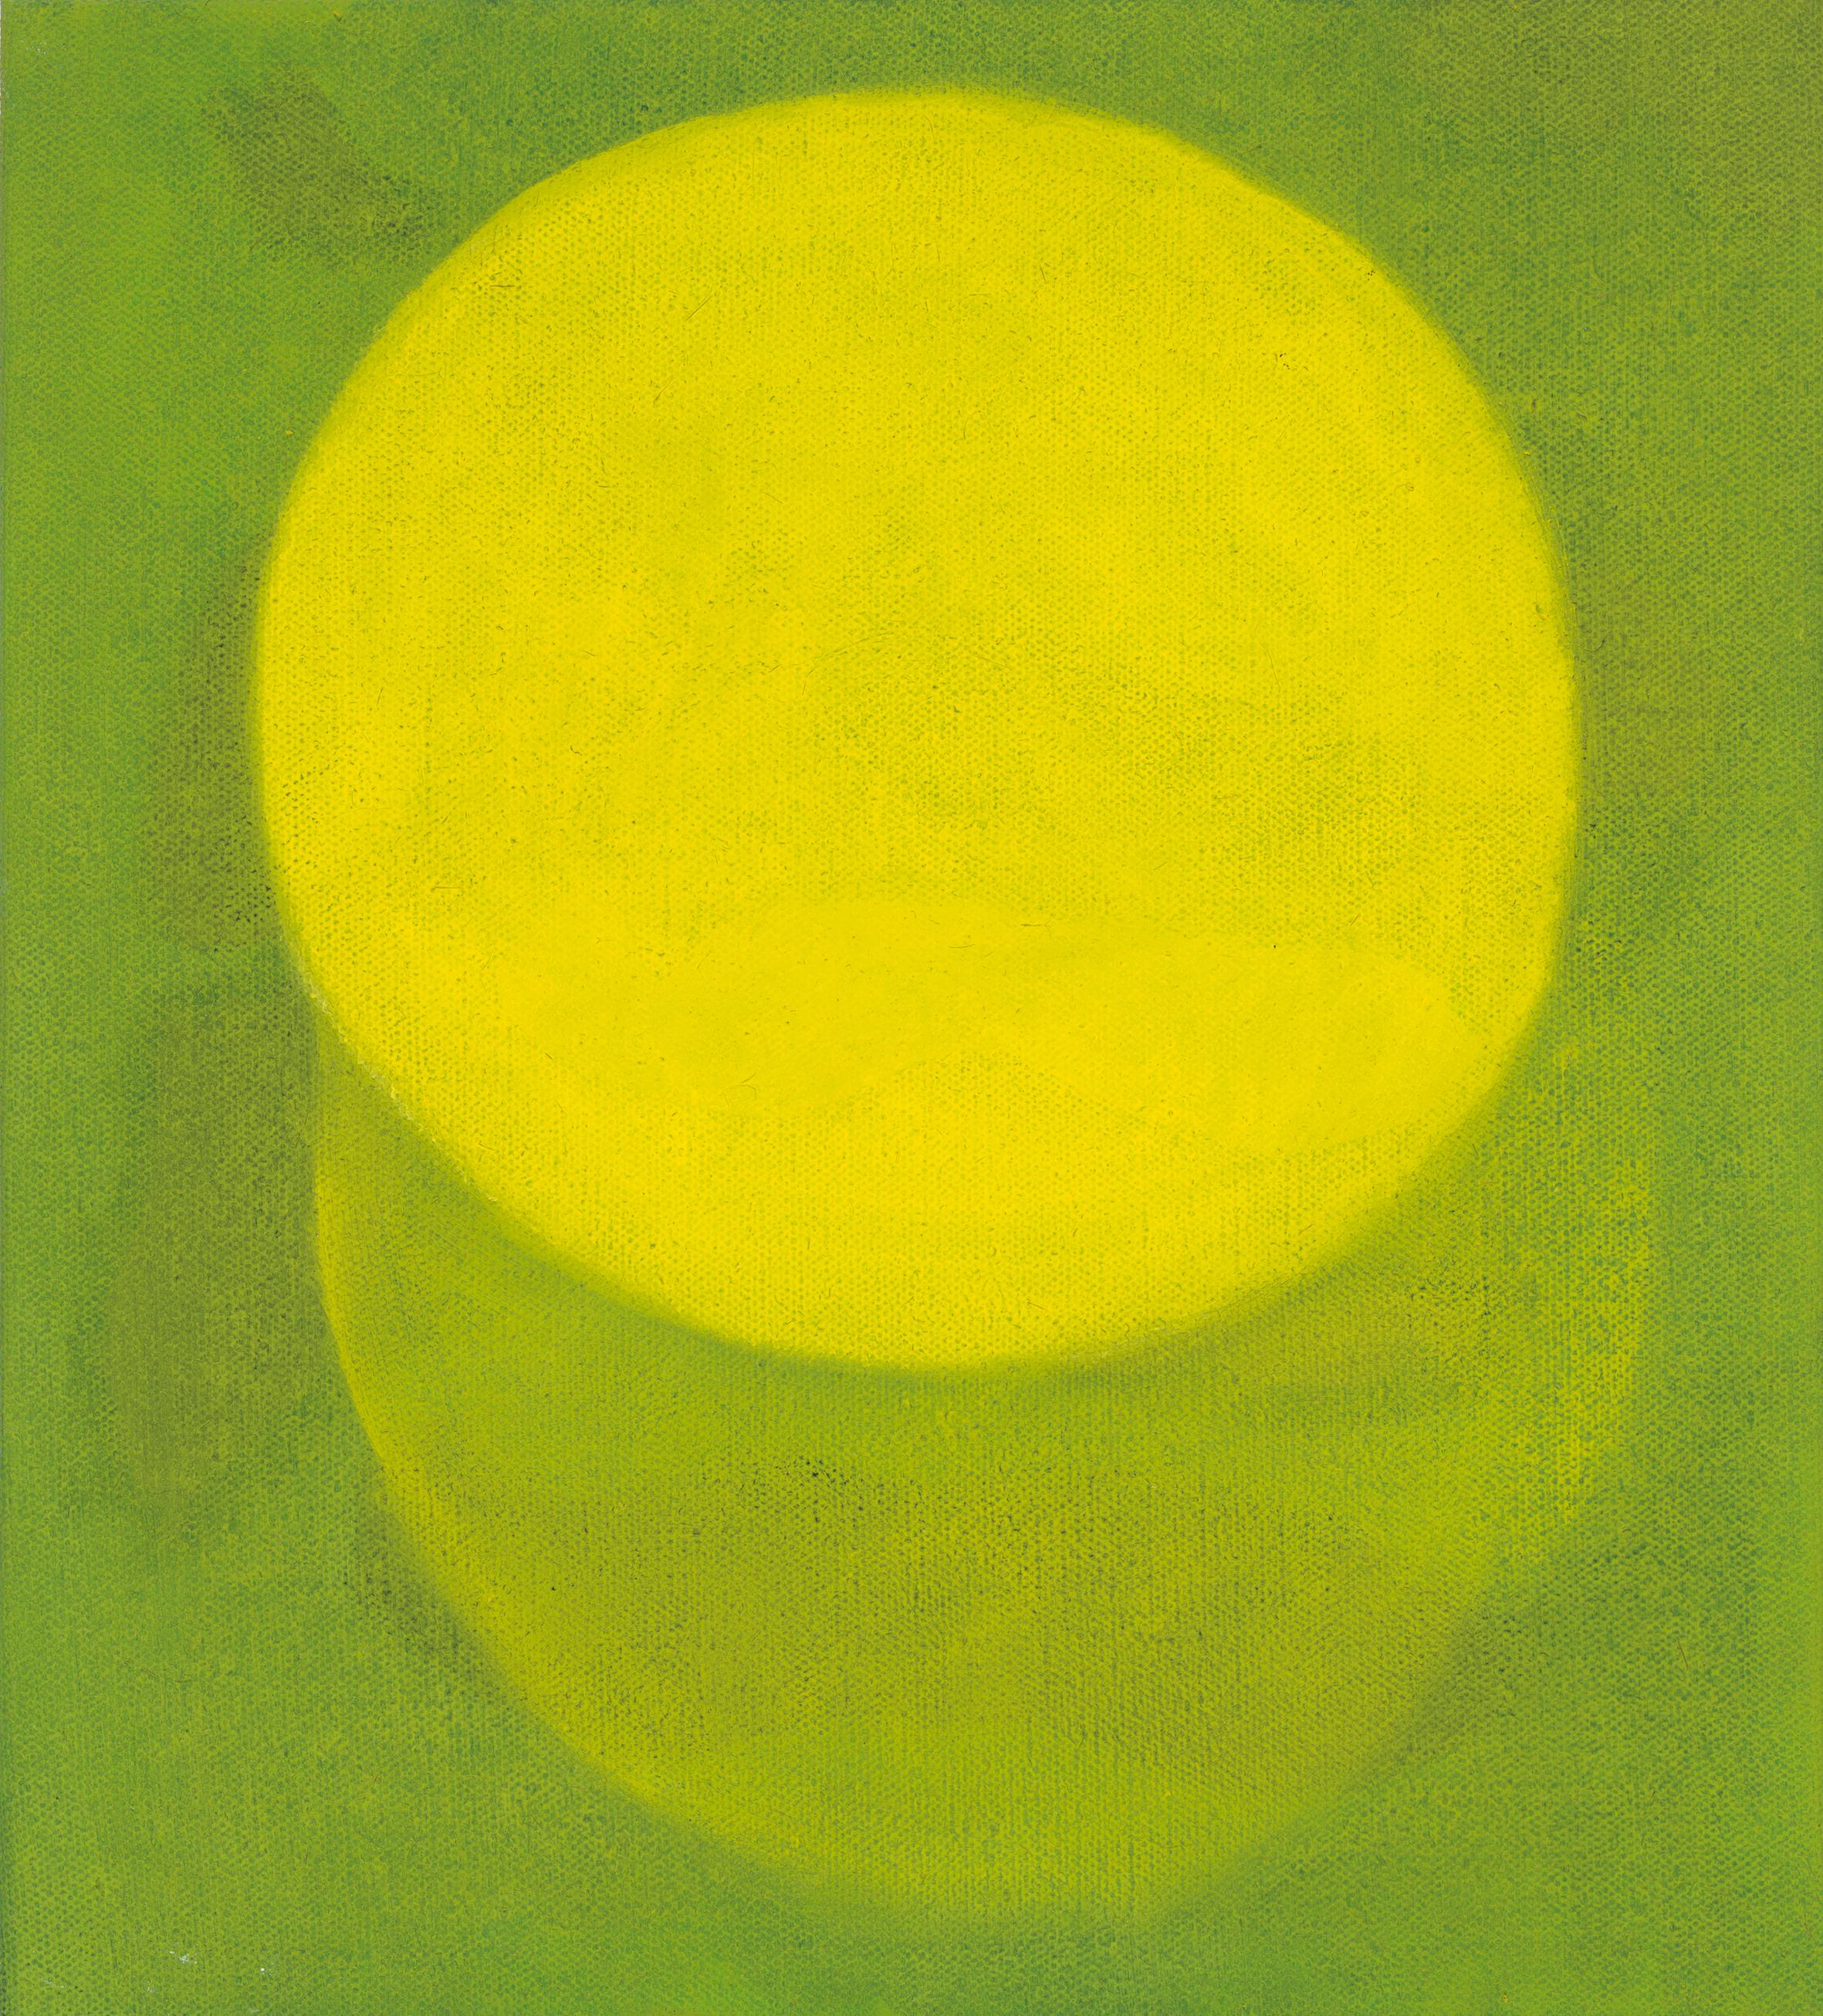 Sunlight Through the Golden Elm on the top lawn of Delara. 2019, oil on linen, 46 x 41 cm.